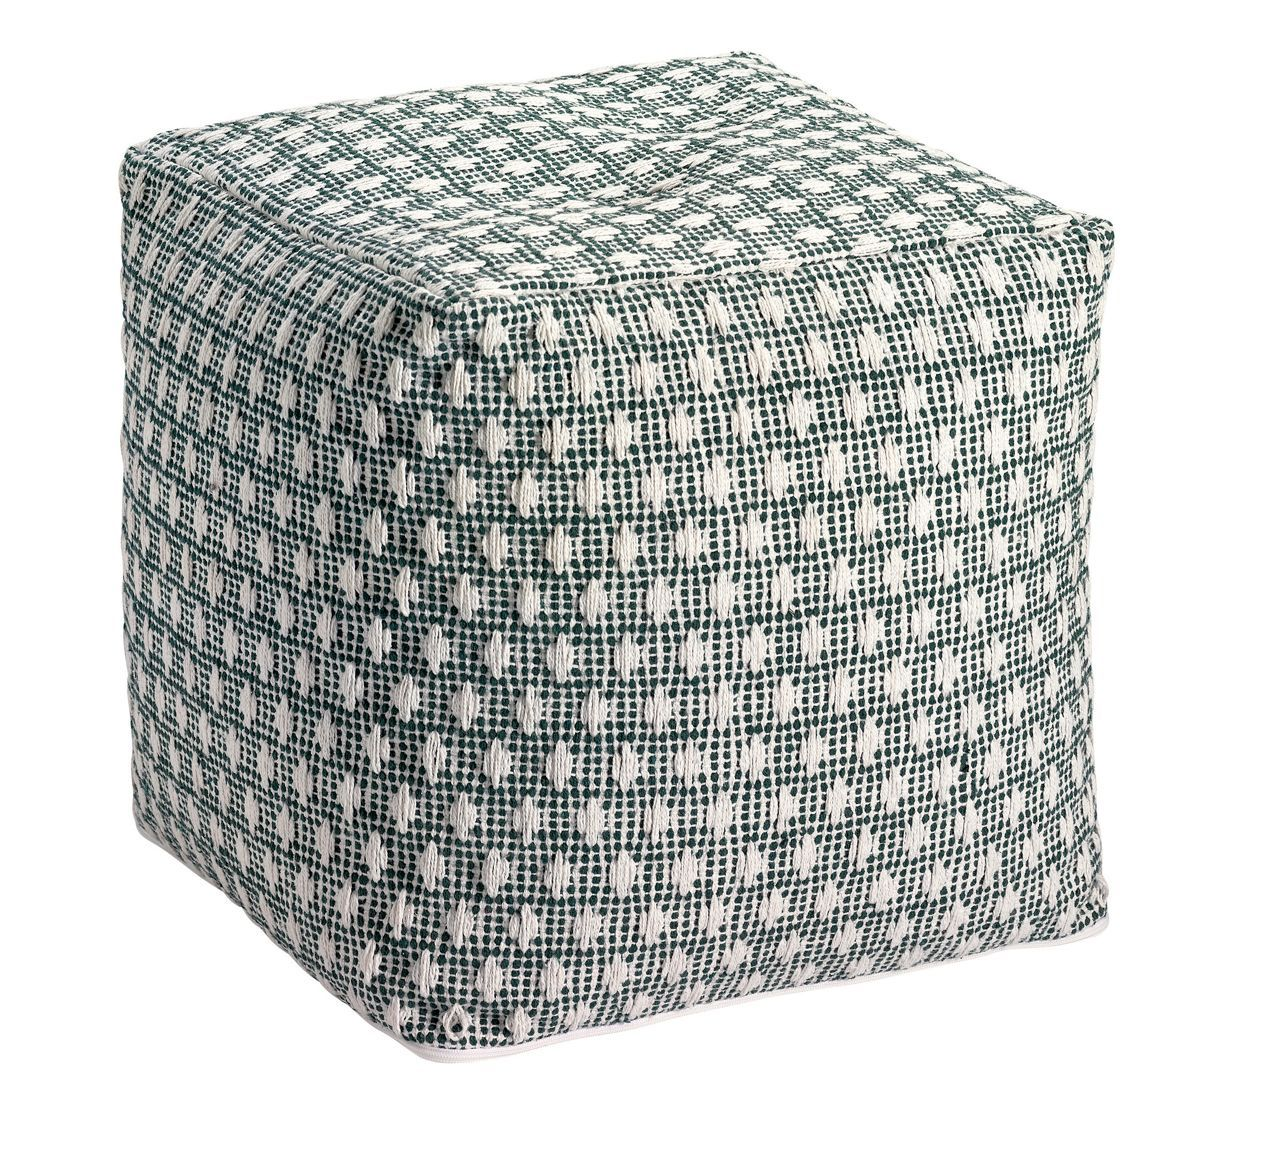 pouf moor a vert mousse broderies ethniques coton winkler. Black Bedroom Furniture Sets. Home Design Ideas